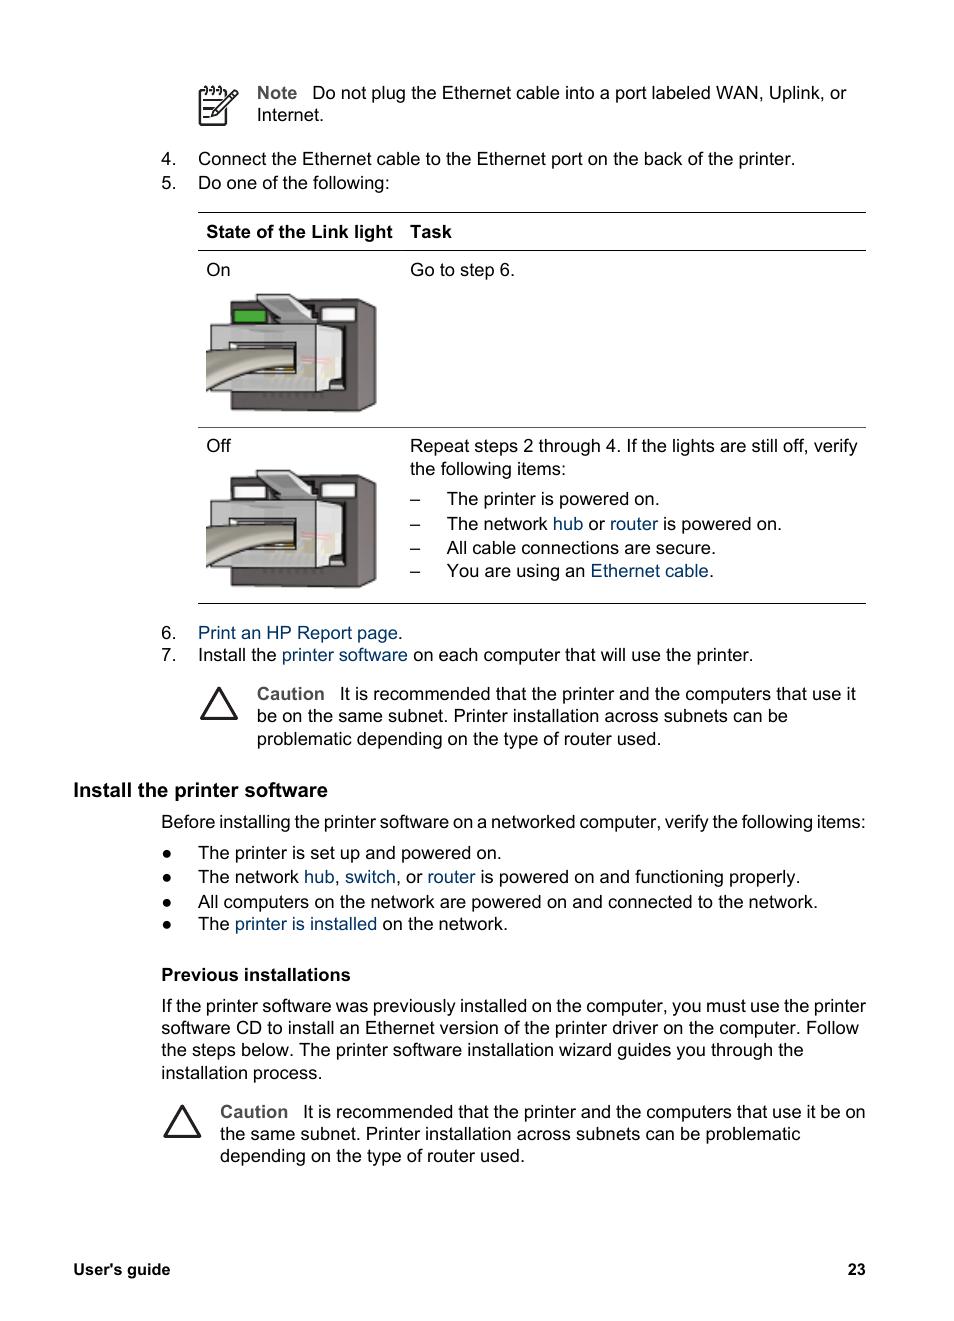 install the printer software hp deskjet 6940 user manual page 25 rh manualsdir com hp deskjet 6940 manuel hp deskjet 6940 service manual